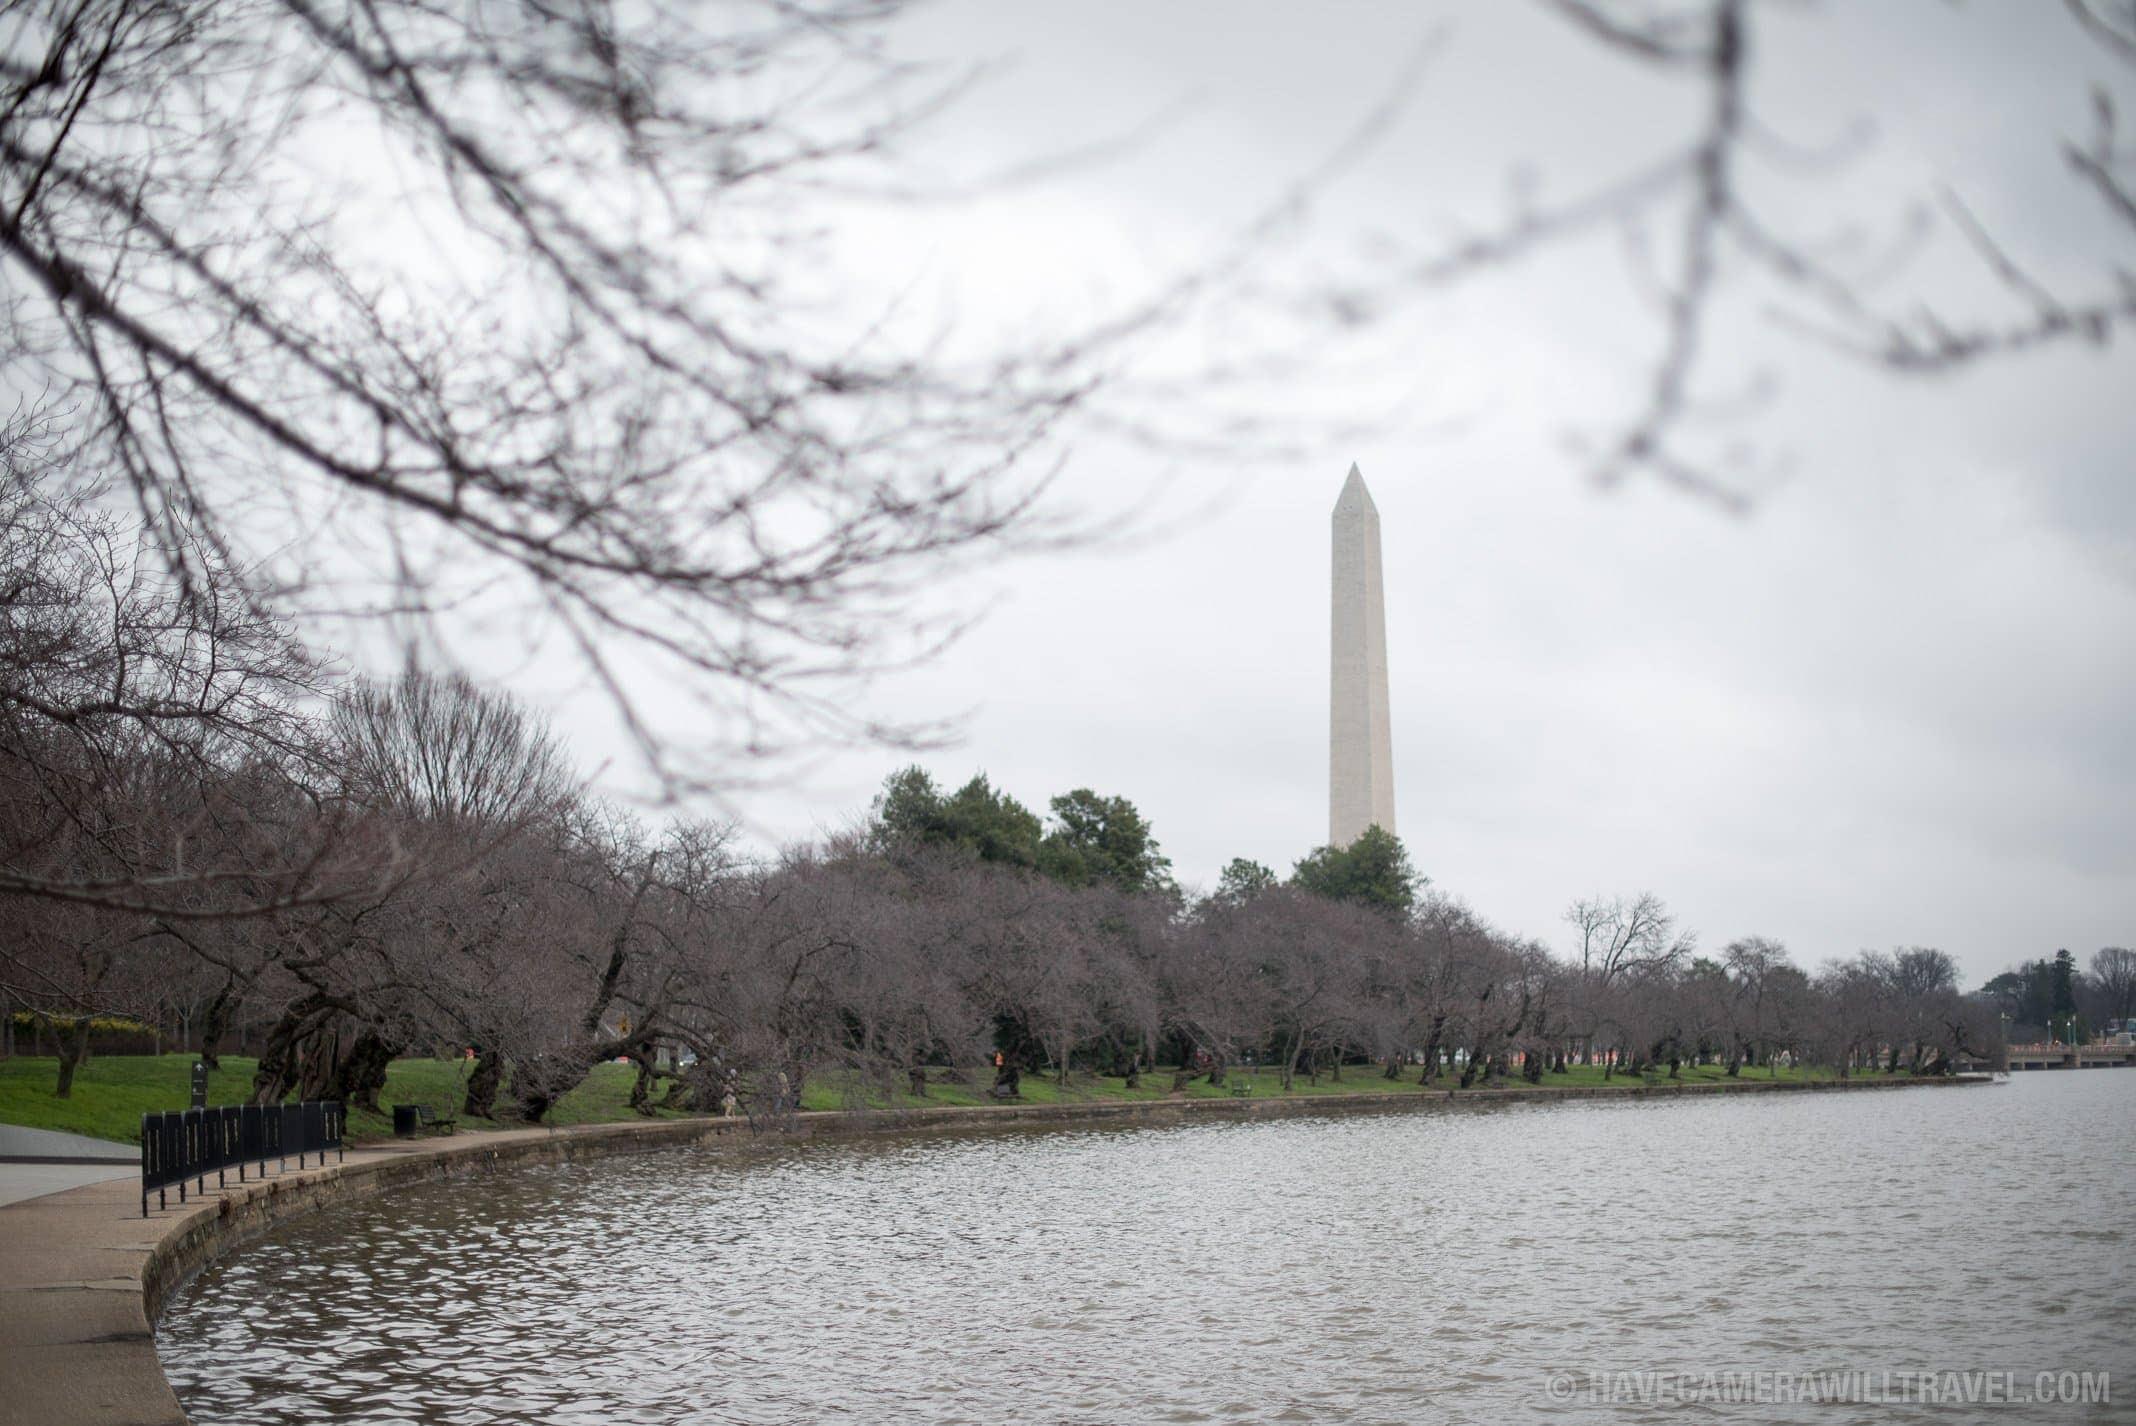 Washington DC Cherry Blossoms December 30, 2015